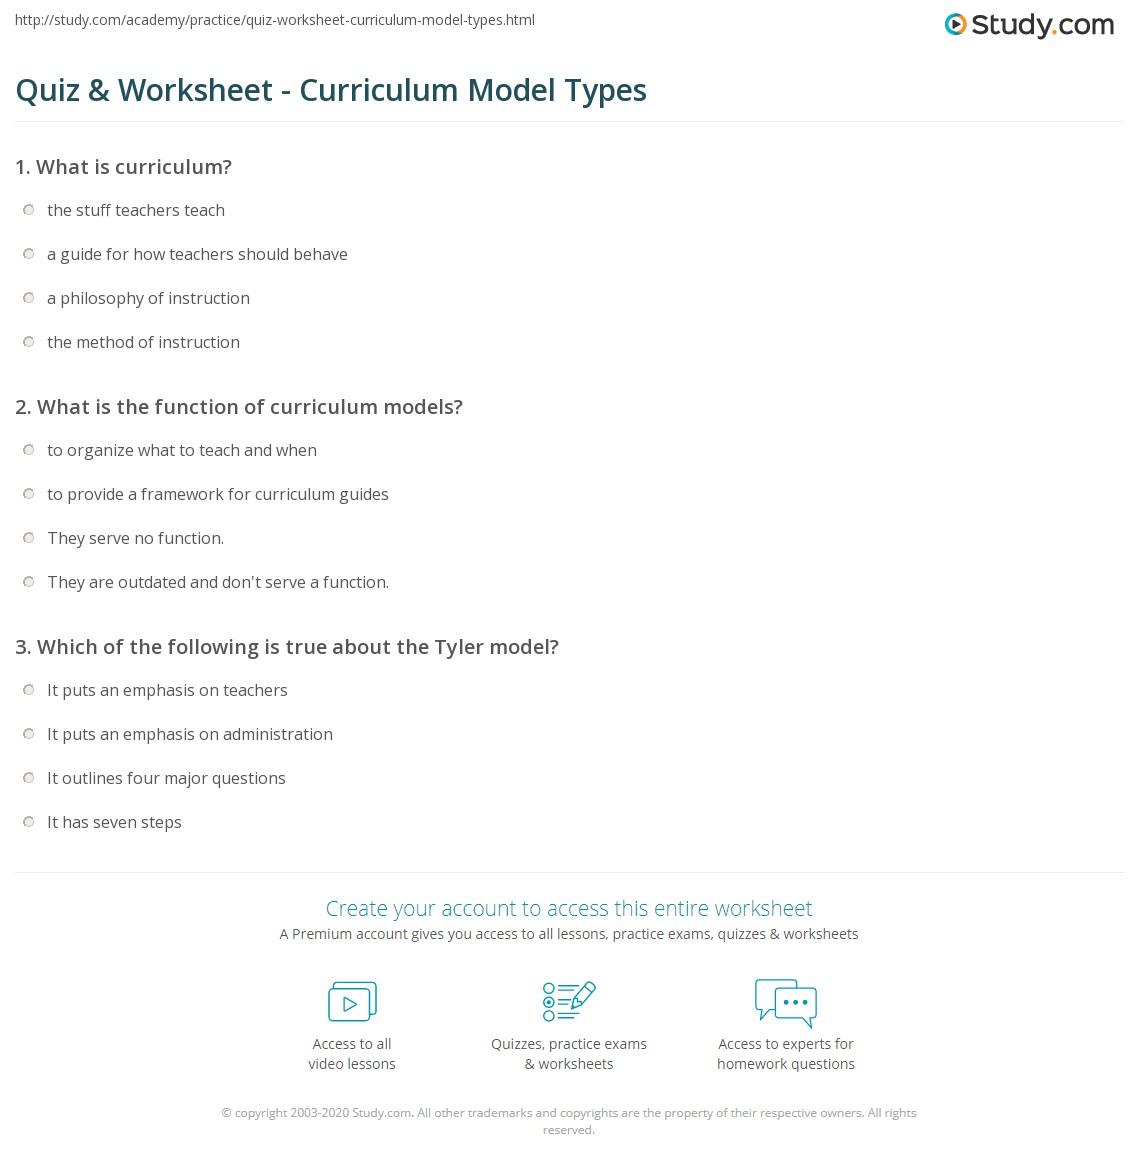 quiz worksheet curriculum model types. Black Bedroom Furniture Sets. Home Design Ideas